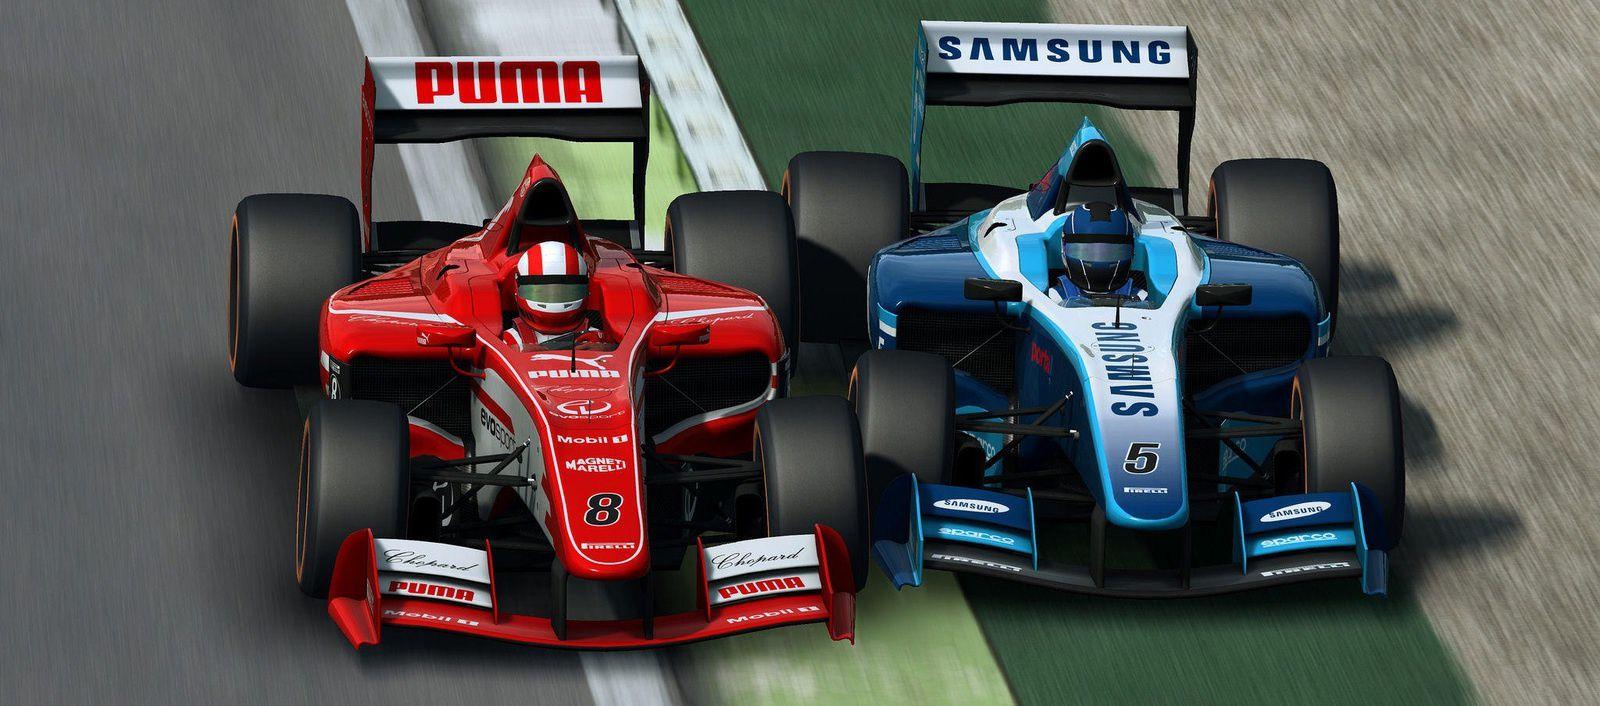 La Formula Raceroom 2 sous le sapin ?